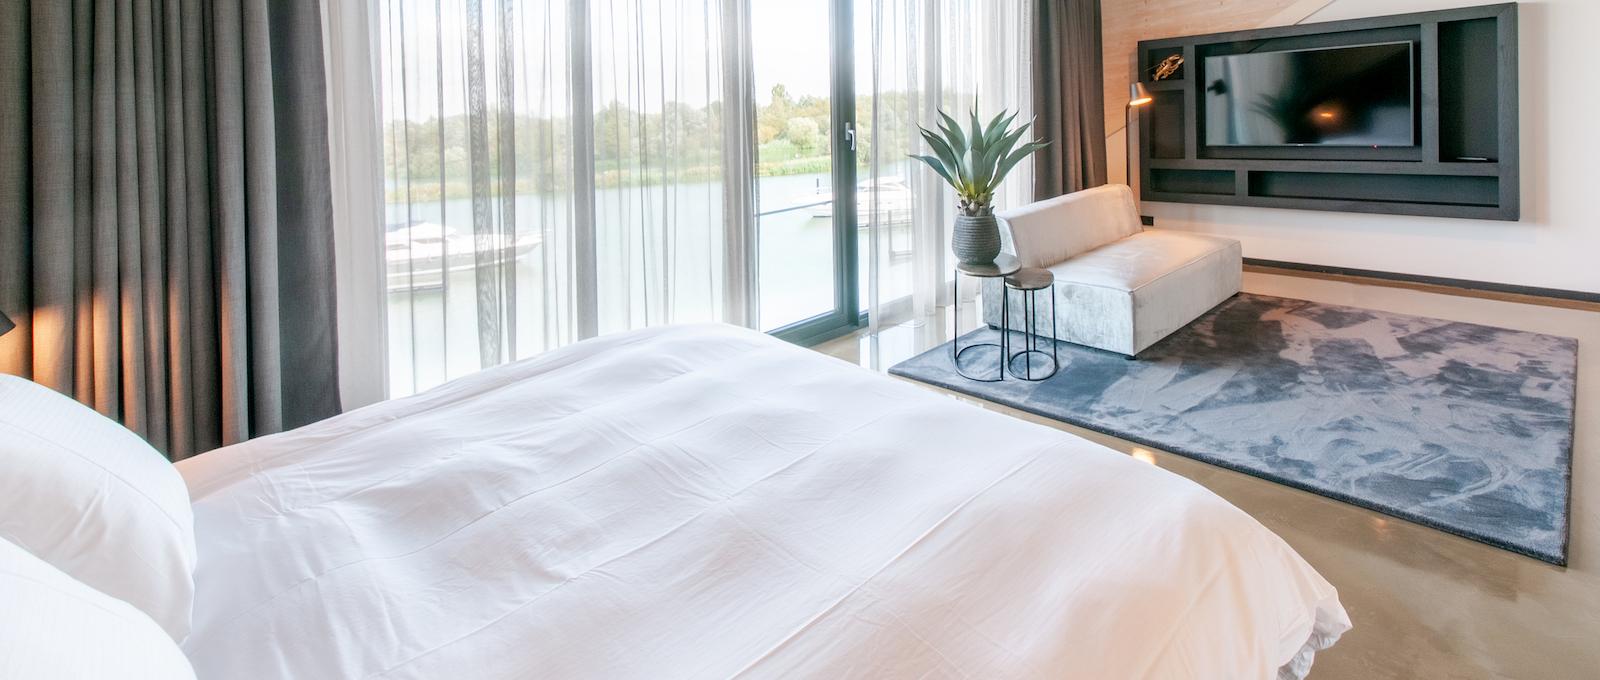 Supertrips - Hotel Oesterdam